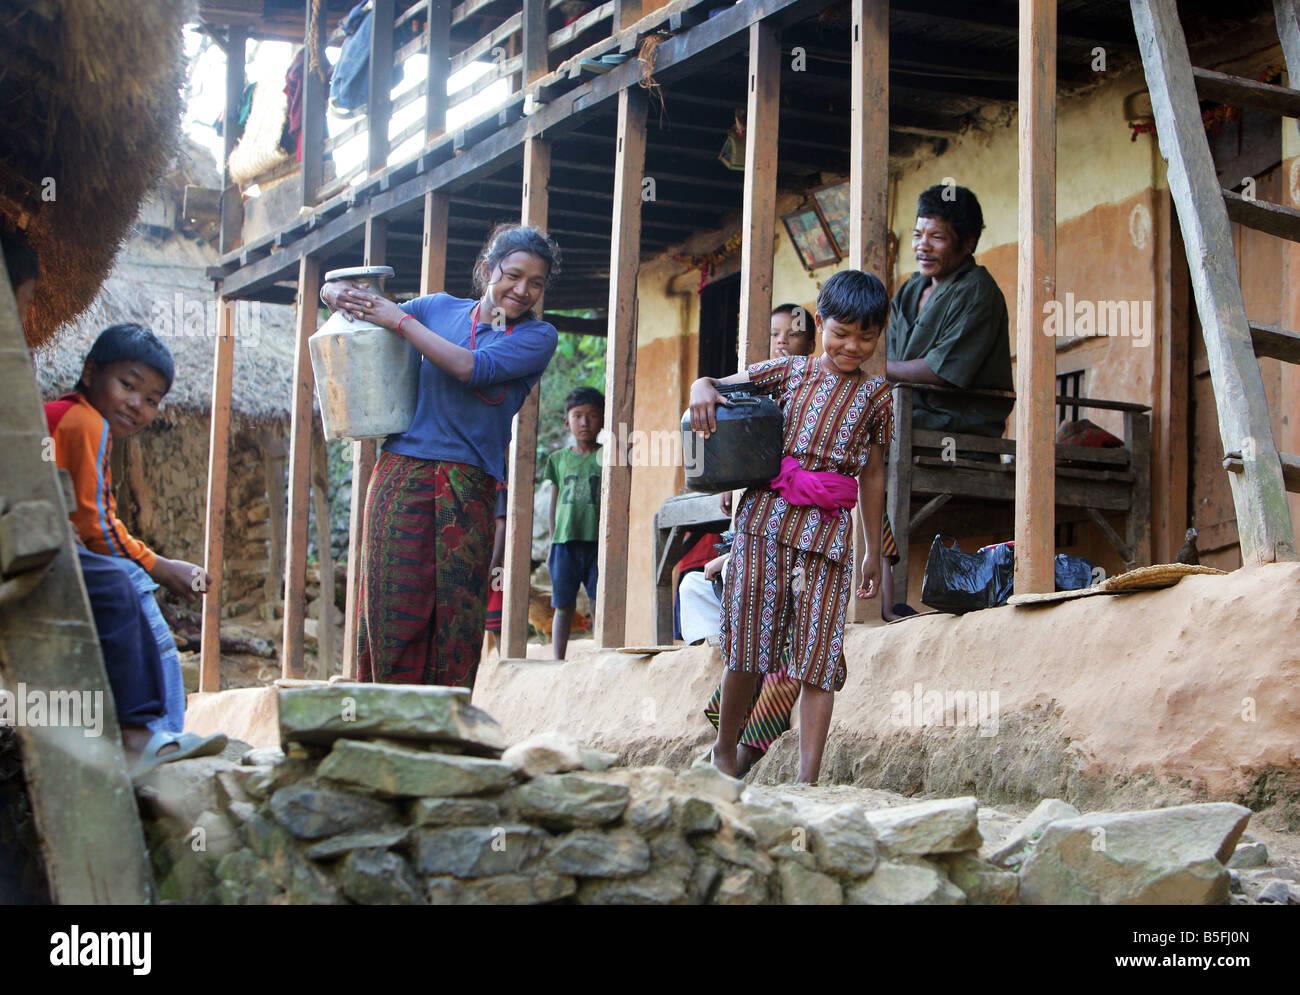 Nepal, village in the Himalaya mountains - Stock Image